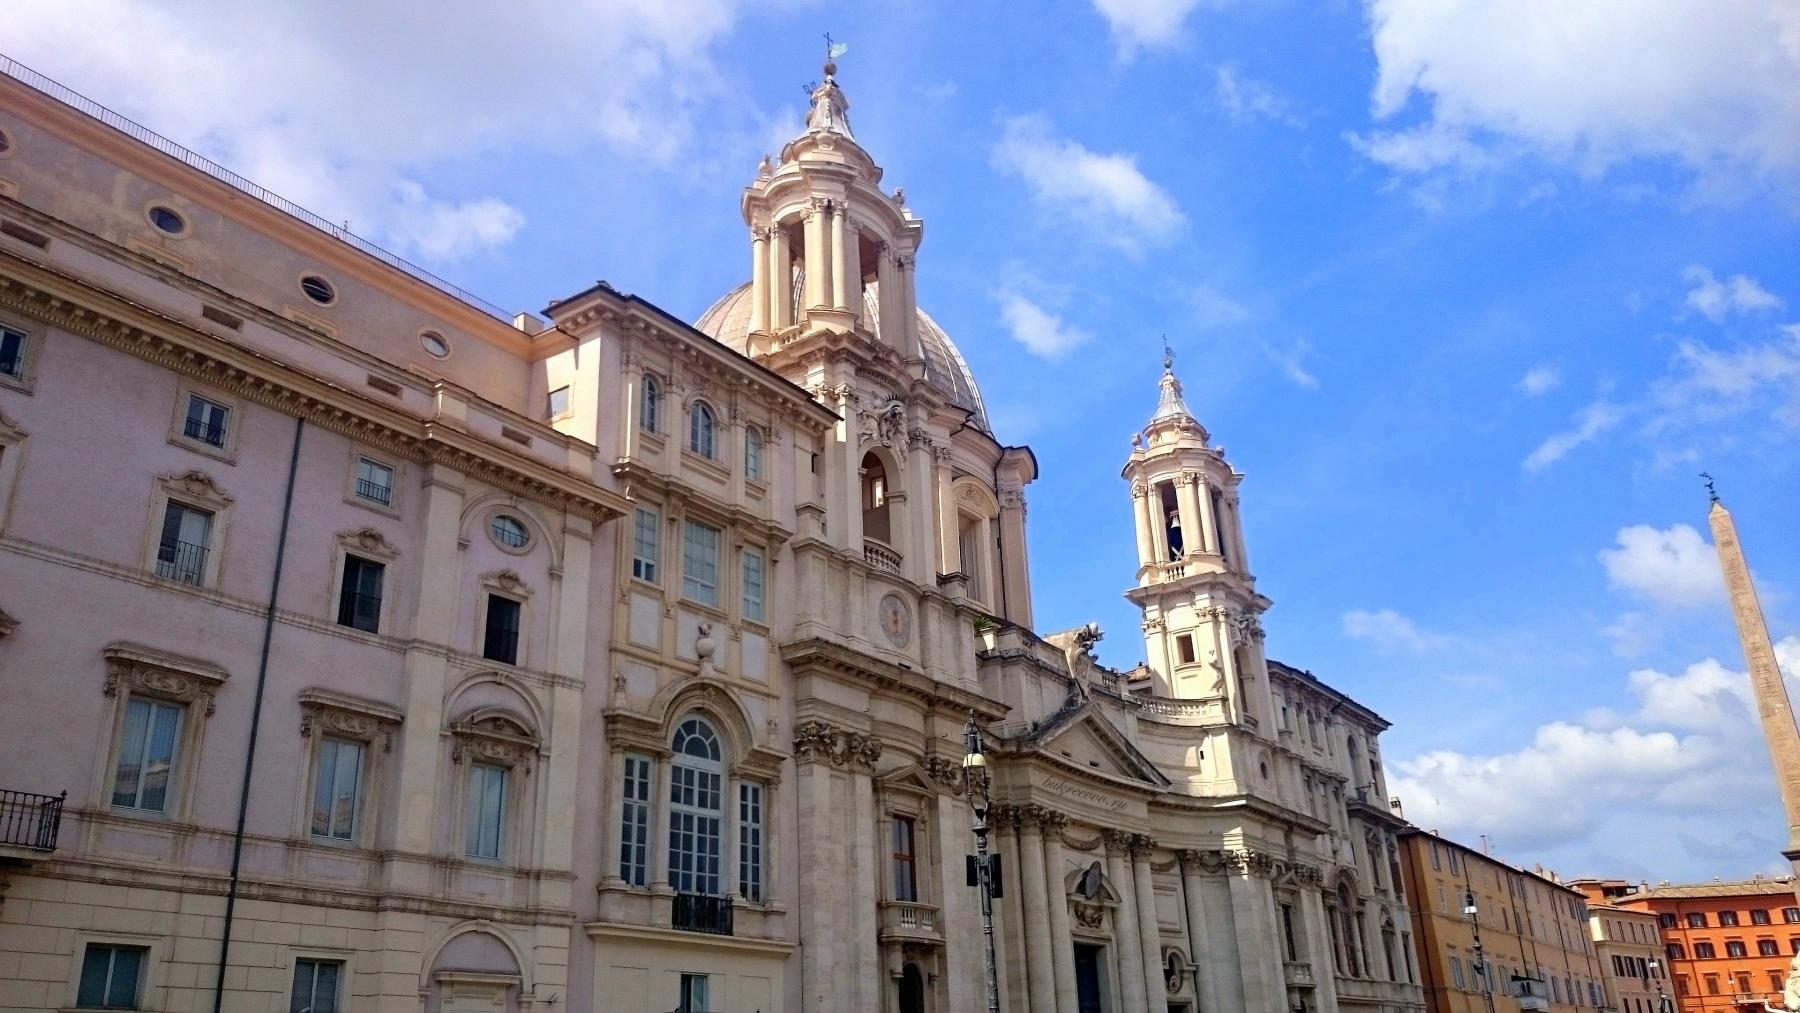 Piazza Navona 53